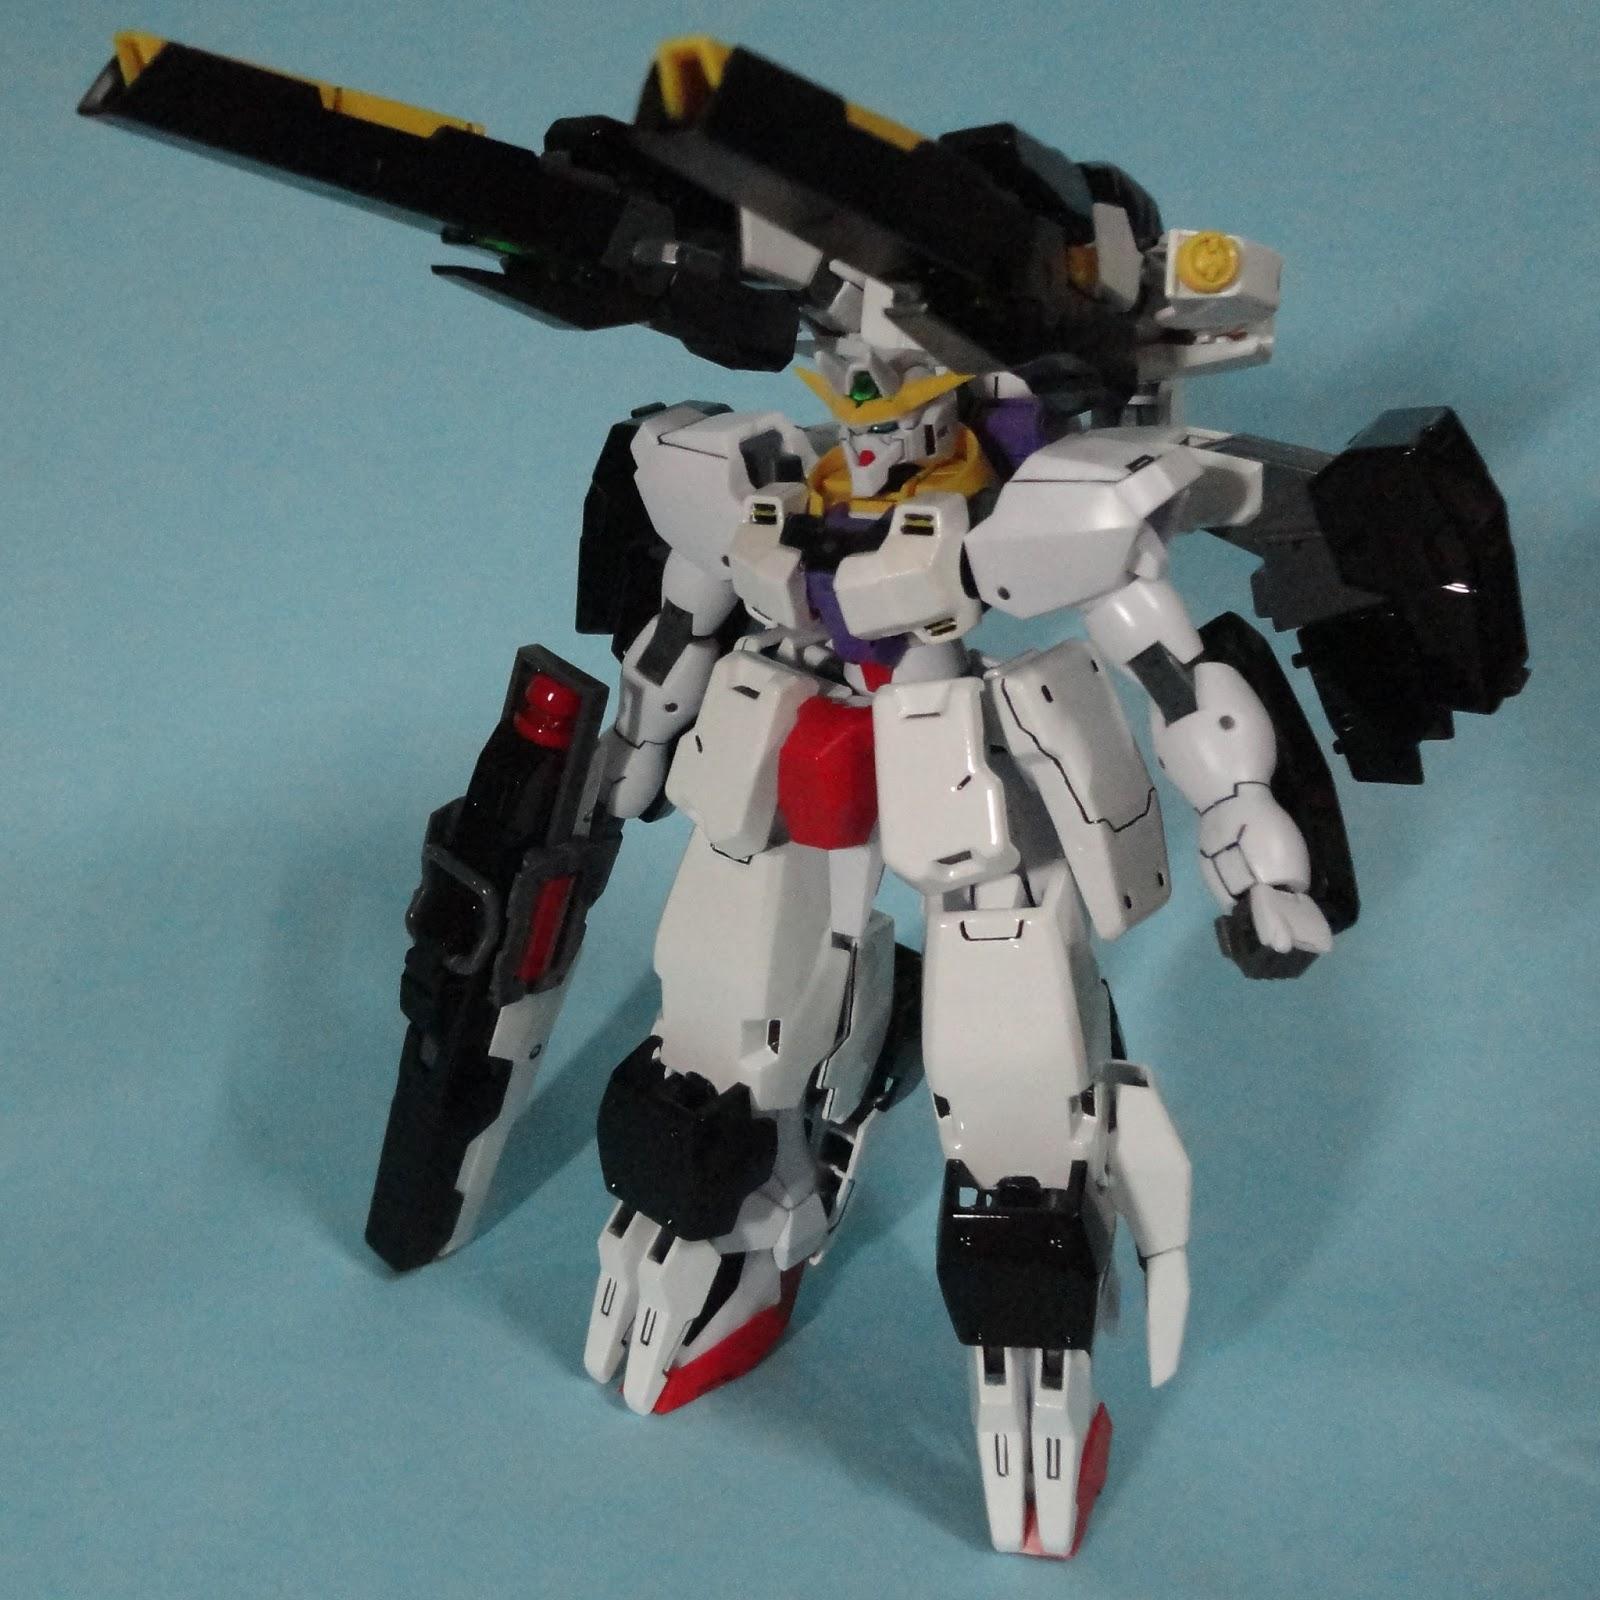 Sdgo Raphael Gundam - YouTube |Raphael Gundam Sdgo